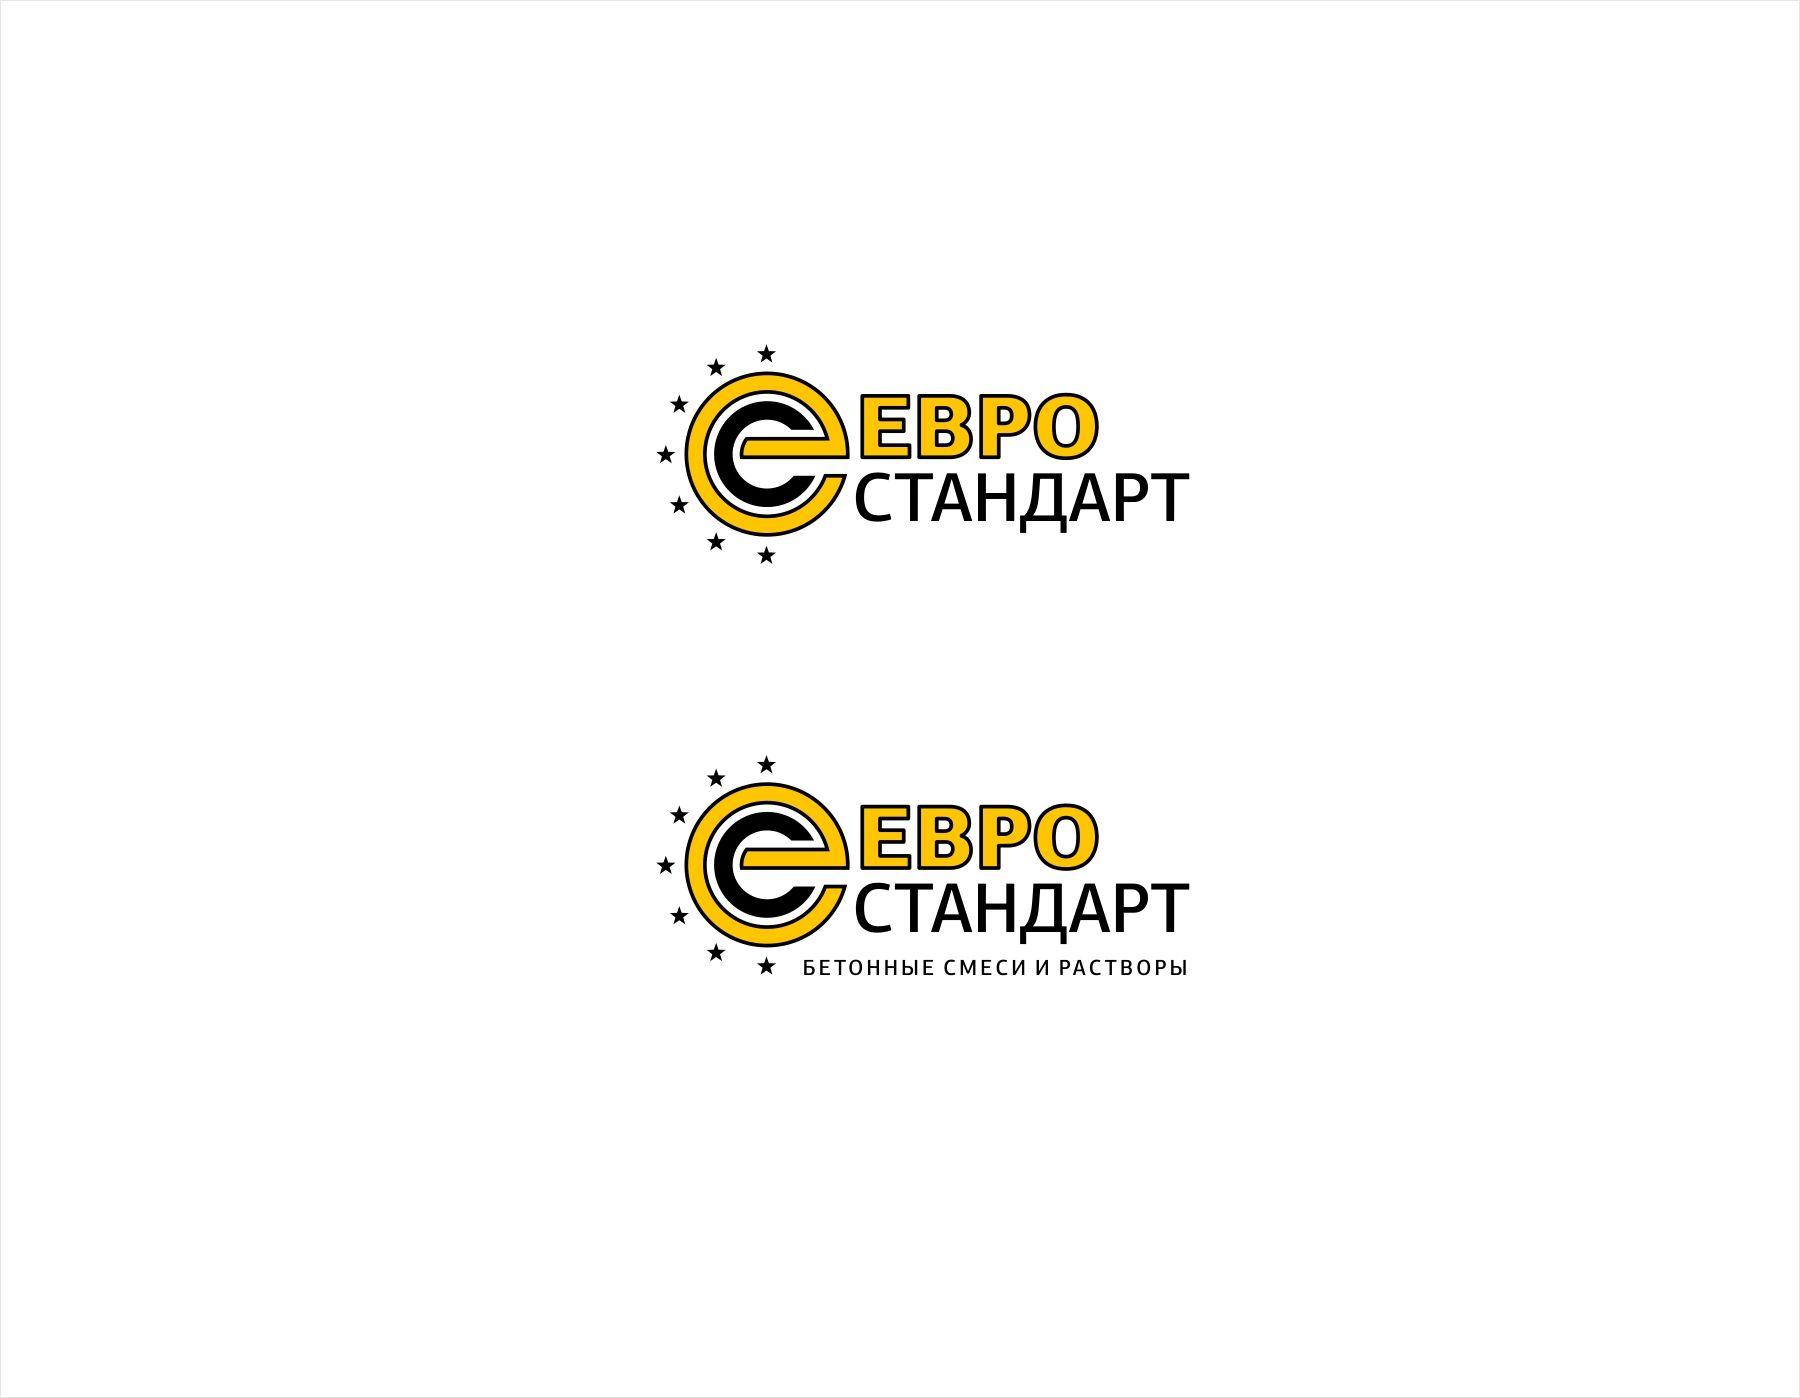 Логотип для ЕвроСтандарт Бетон - дизайнер kras-sky